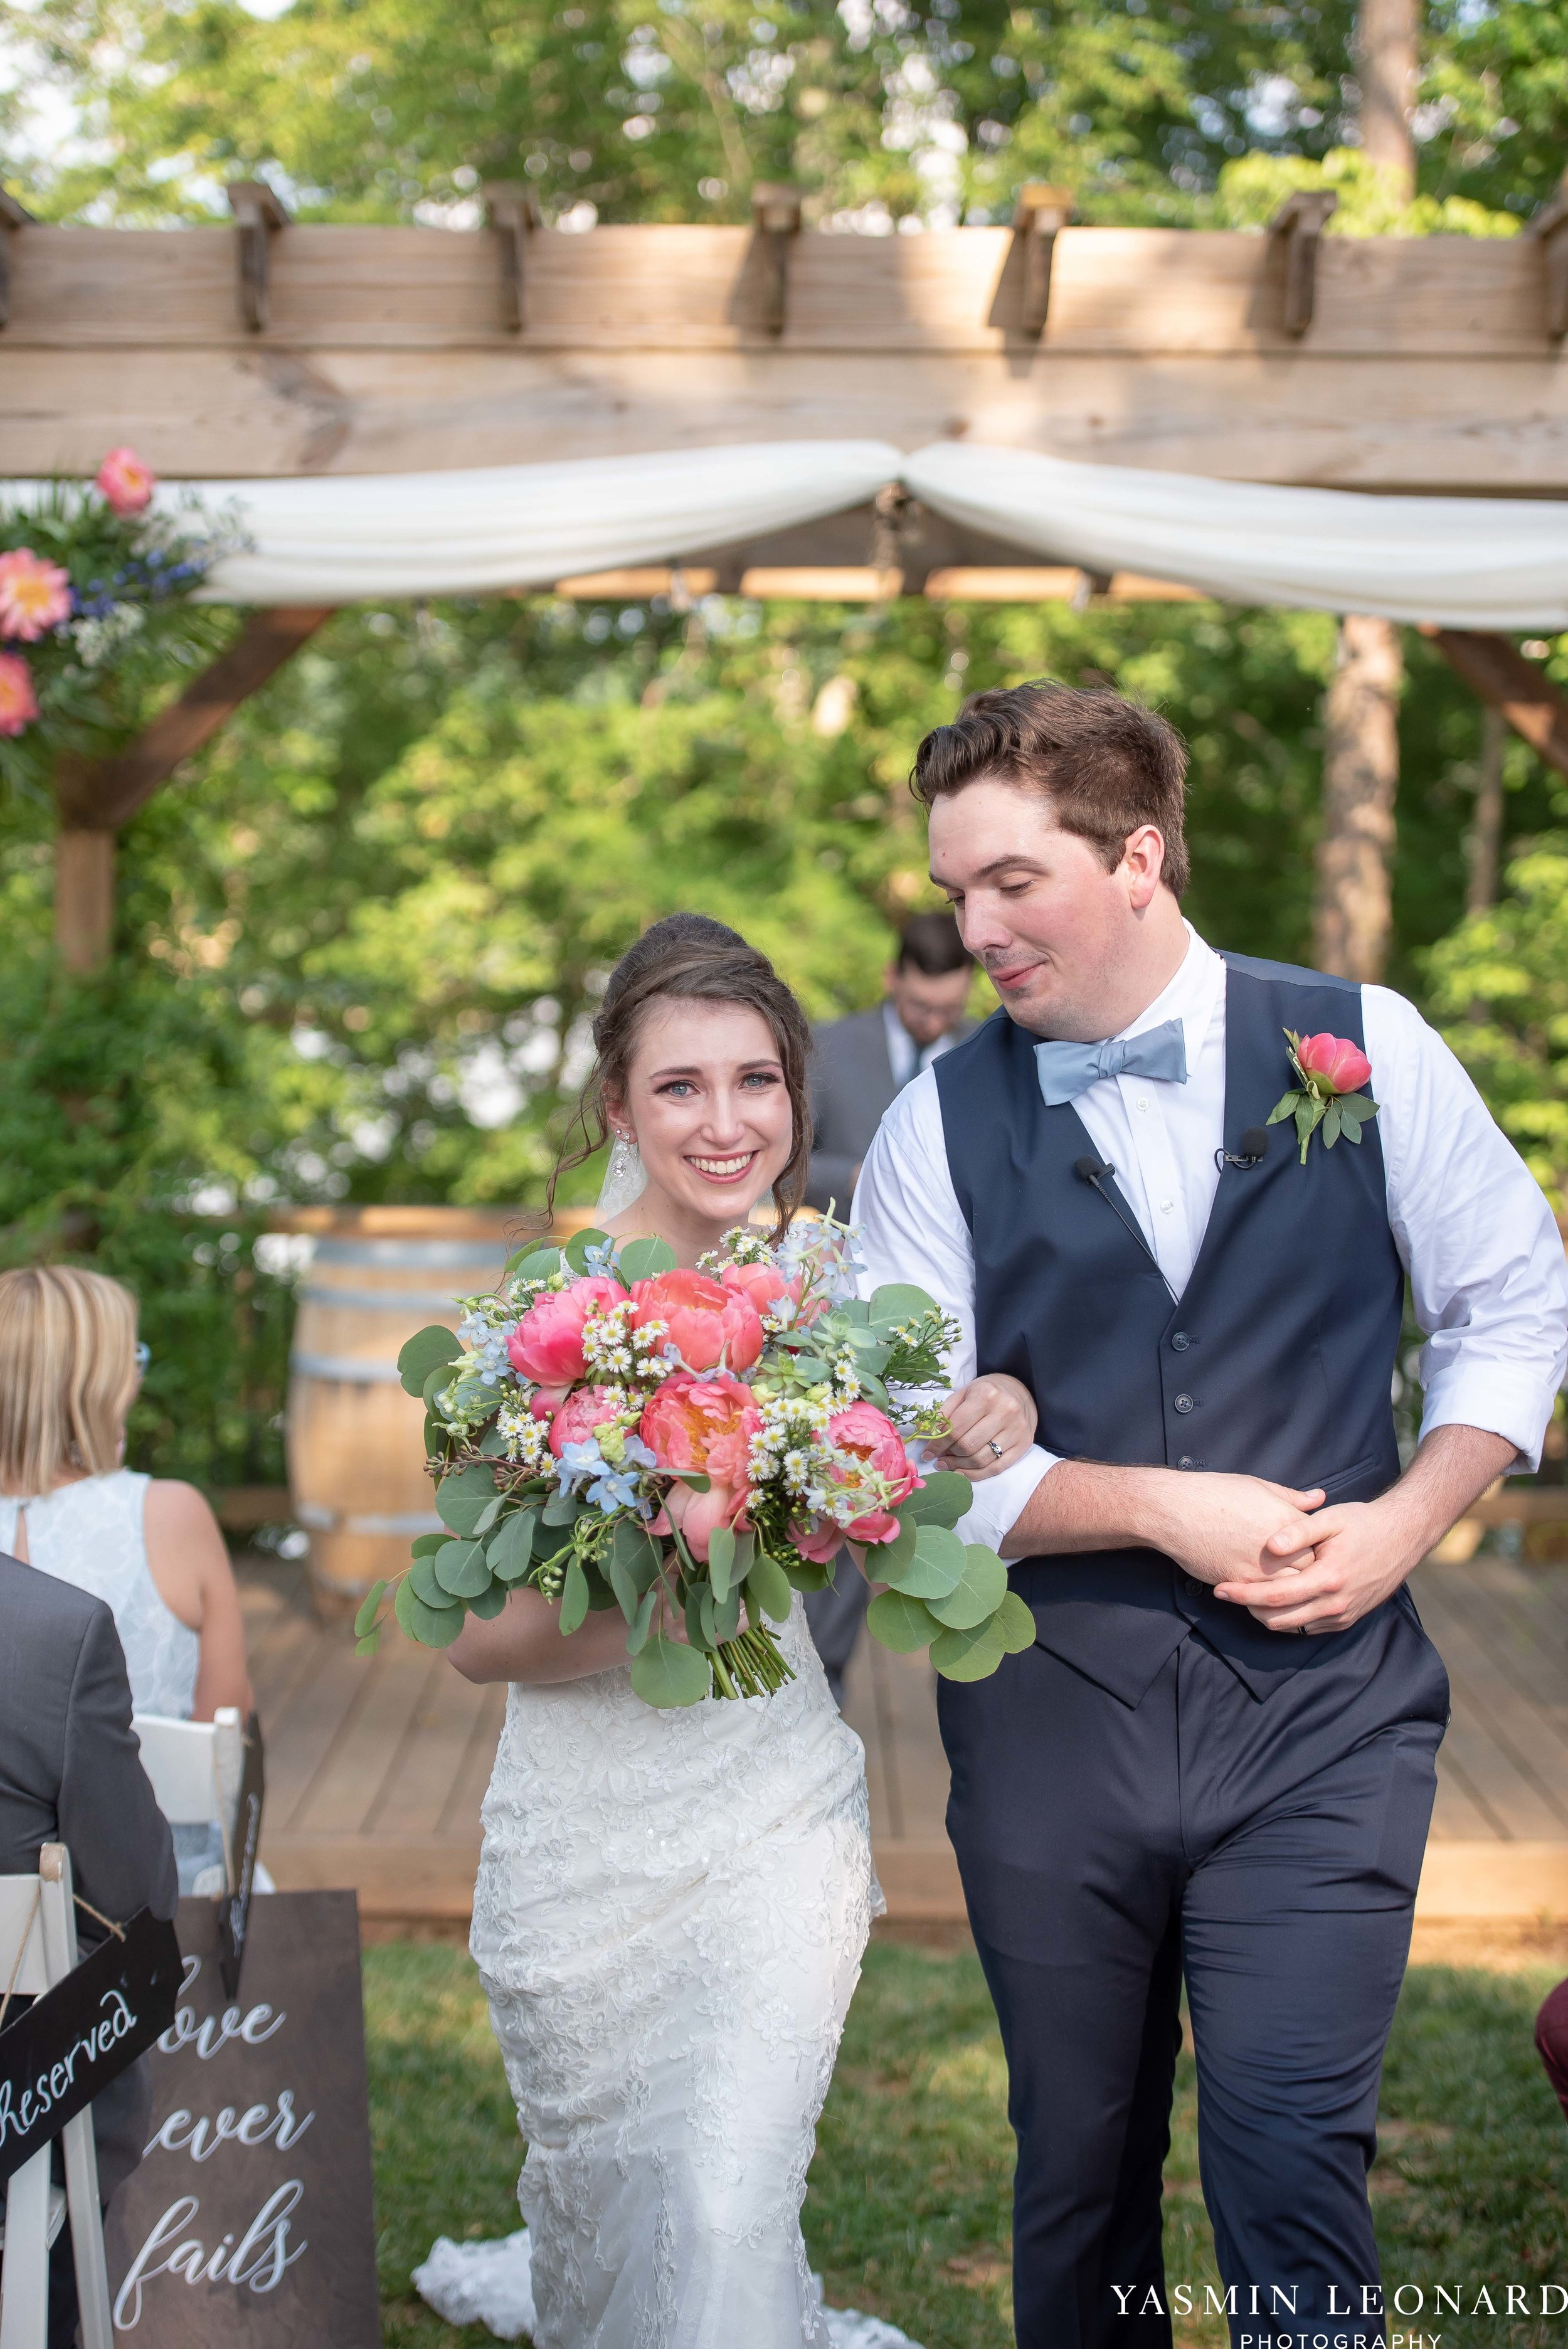 Old Homeplace Vineyard - NC Weddings - Outdoor Summer Weddings - Peony Boutique - Vineyard Wedding - NC Photographer - Yasmin Leonard Photography-34.jpg